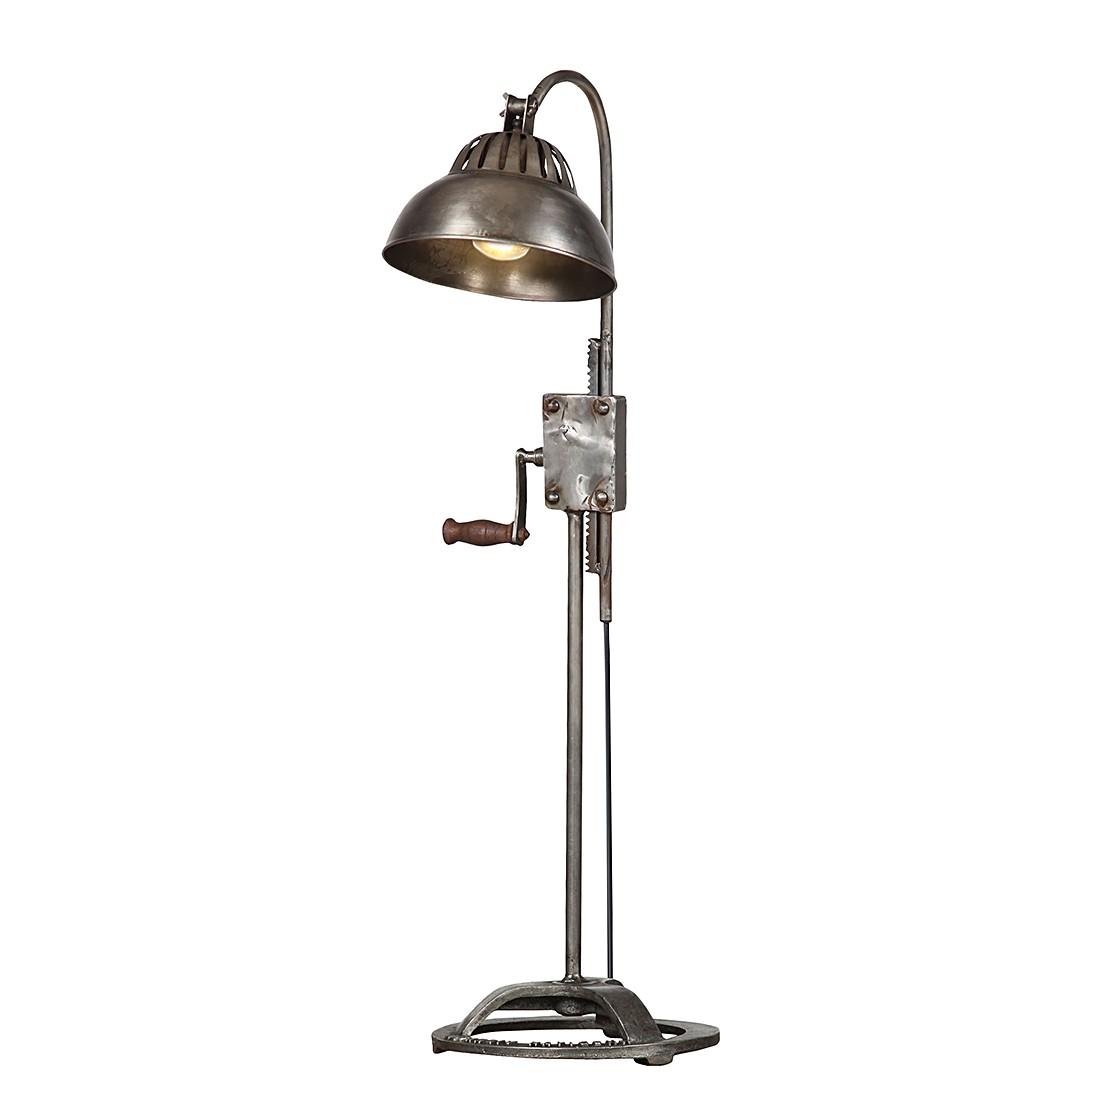 EEK A++, Tischlampe  Vanha II – Eisen – vernickelt – 1-flamming, furnlab jetzt bestellen